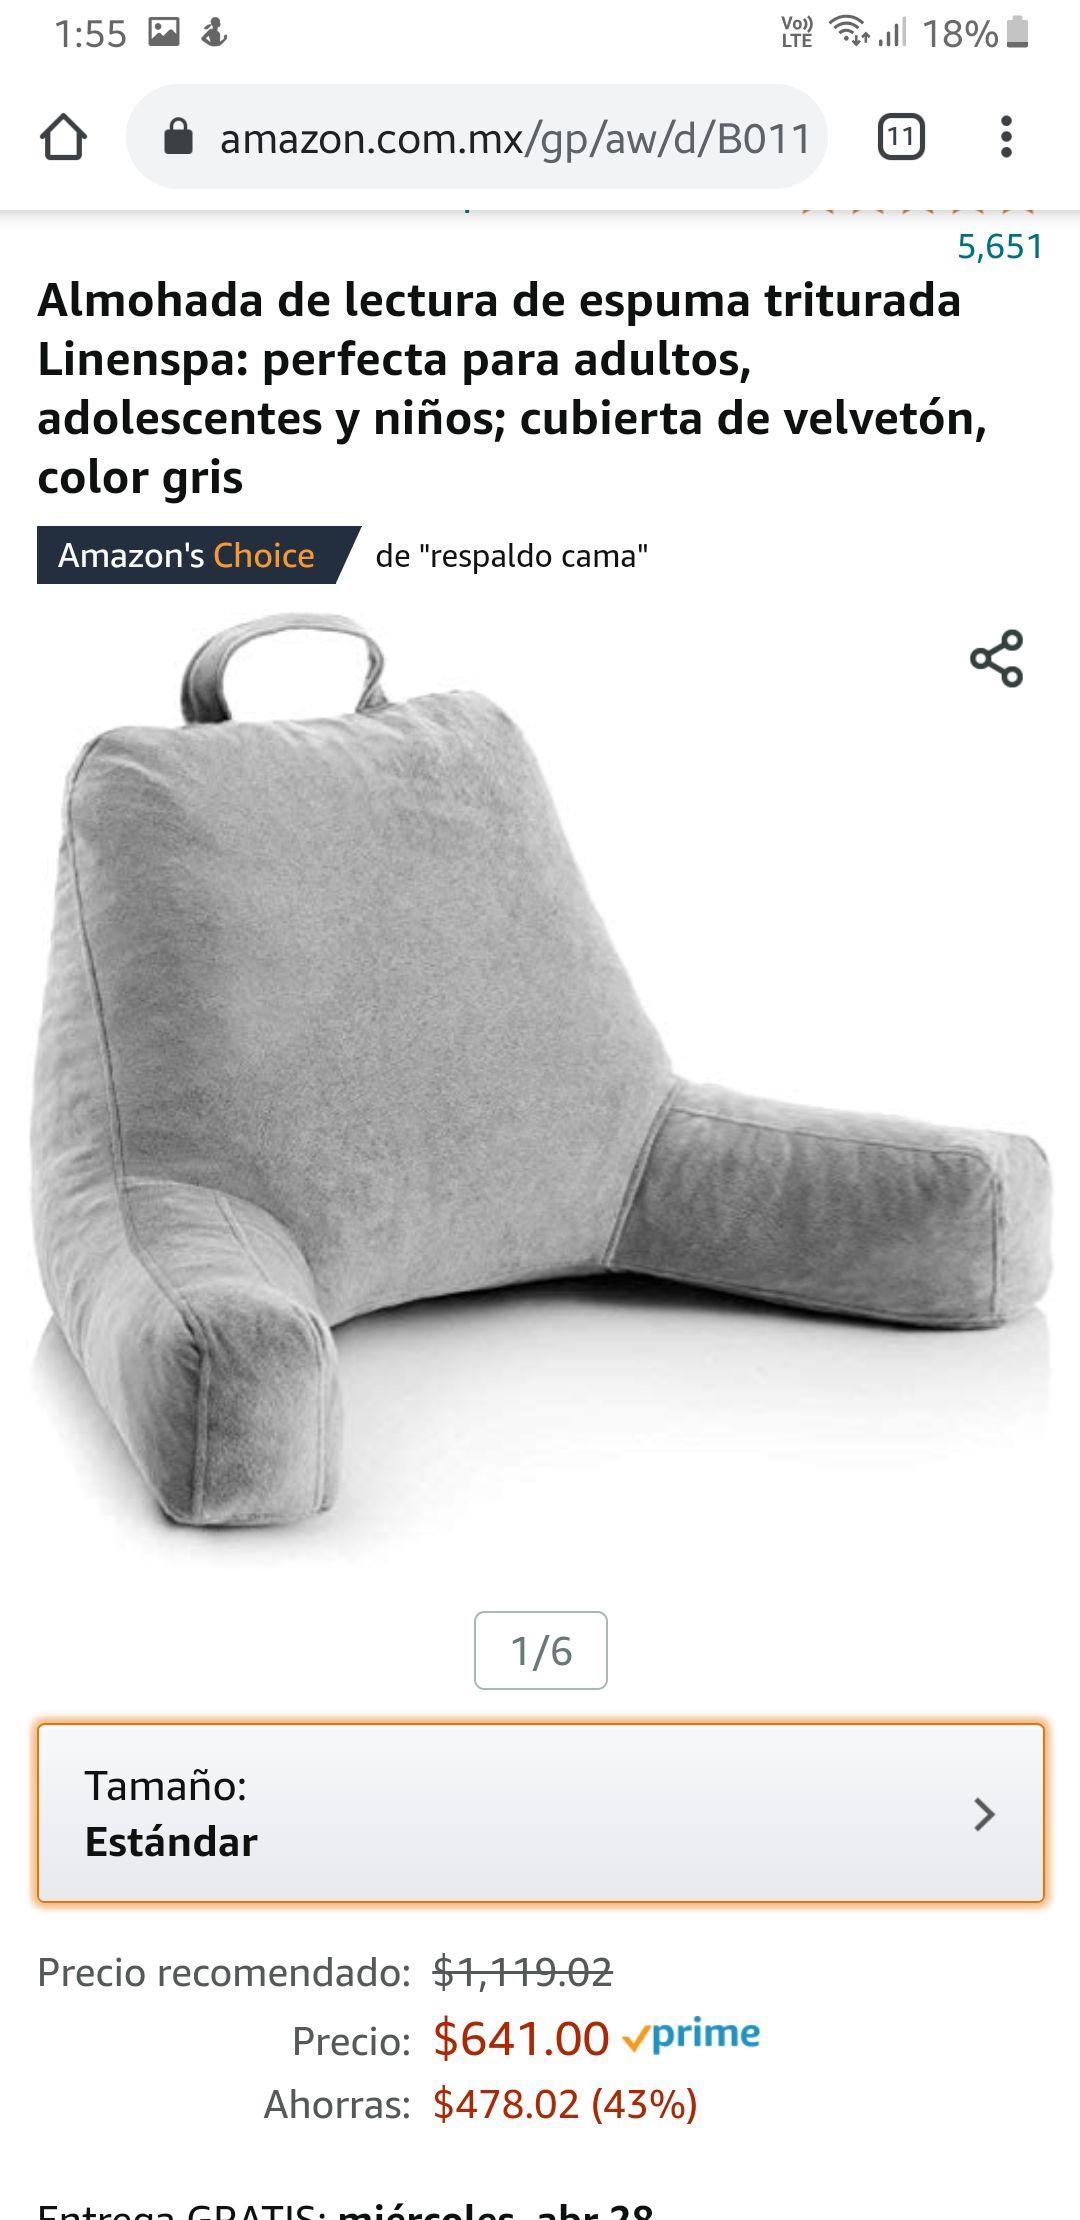 Amazon: Almohada de lectura de espuma